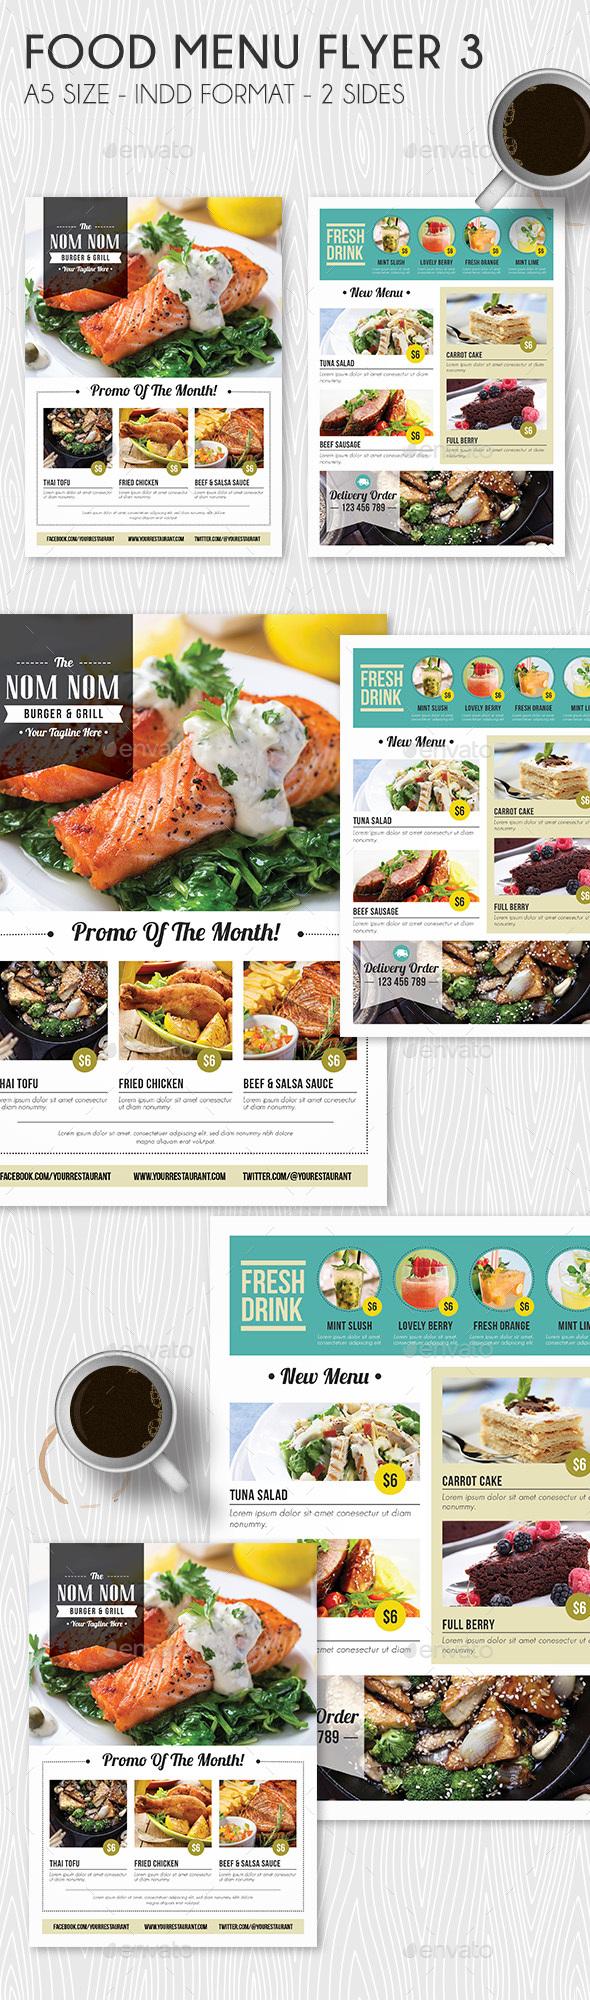 Food Menu Flyer 3 - Restaurant Flyers